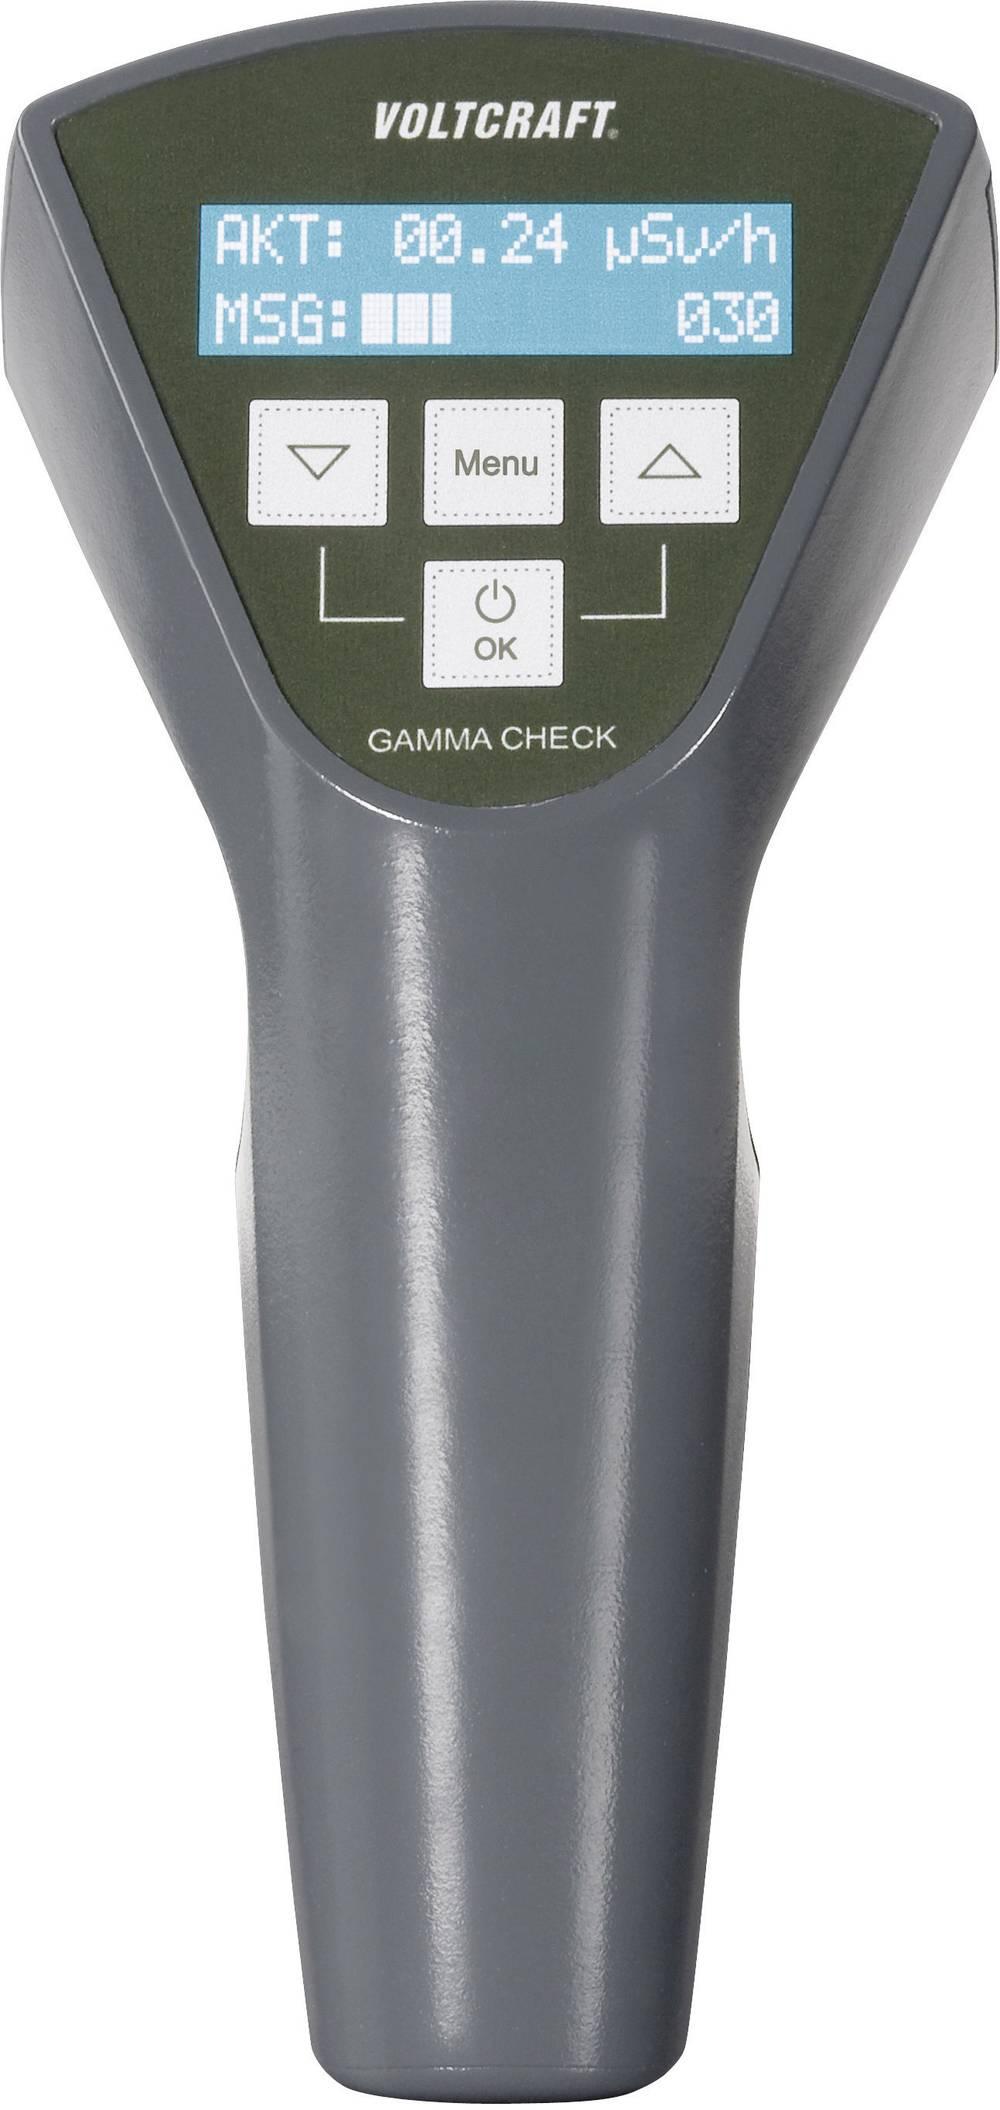 Eclairage Salle De Bain Gamma ~ Voltcraft Gamma Check Acompteur Geiger Appareil De Mesure De